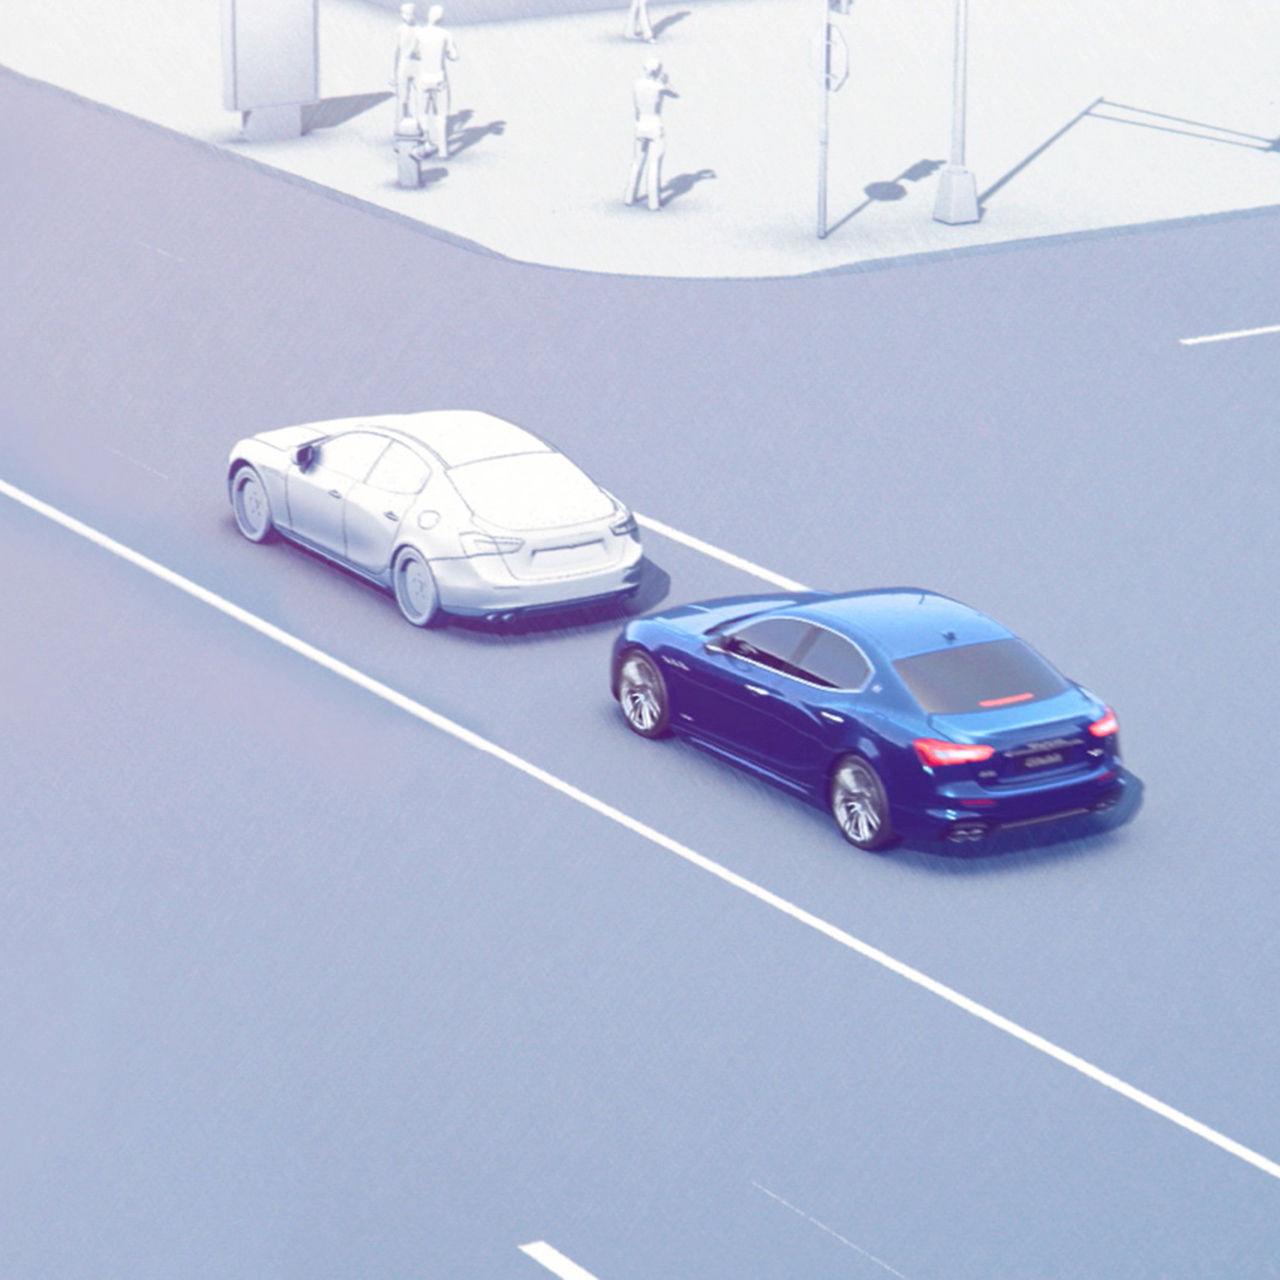 Maserati Forward Collision Warning Plus